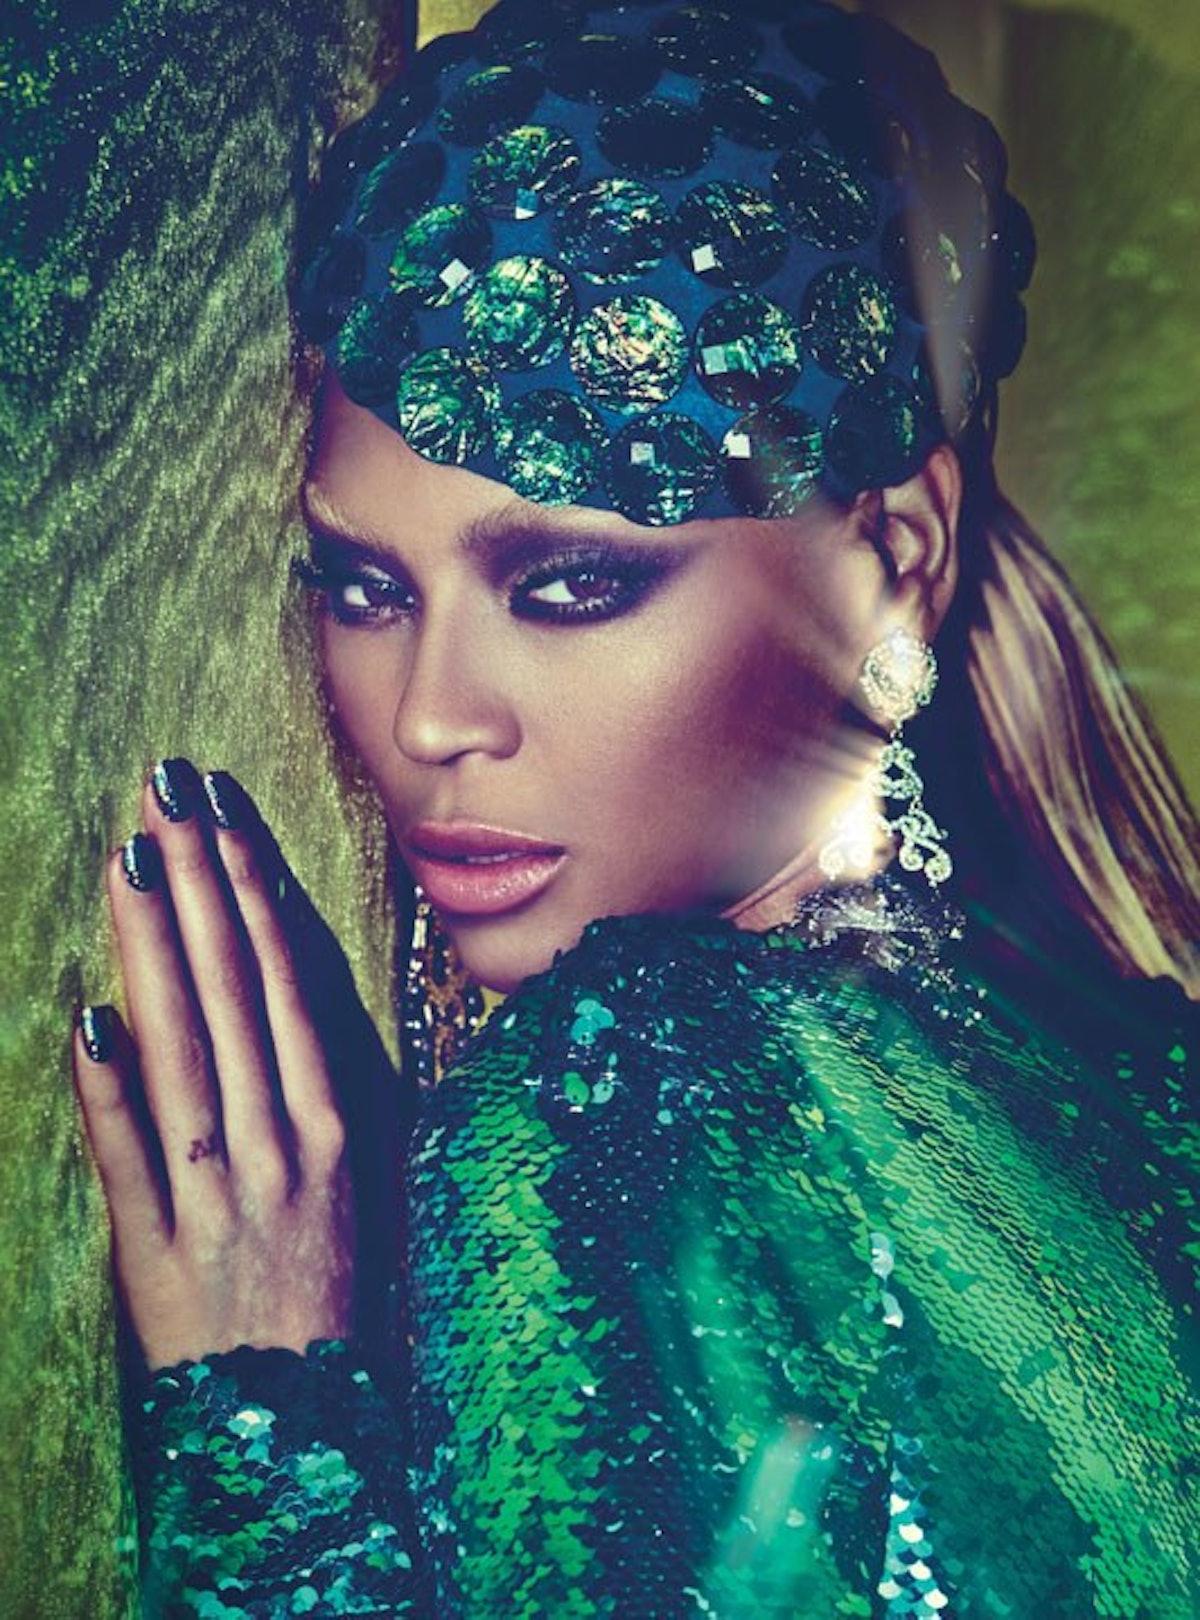 cess-beyonce-fashion-cover-06-l.jpg